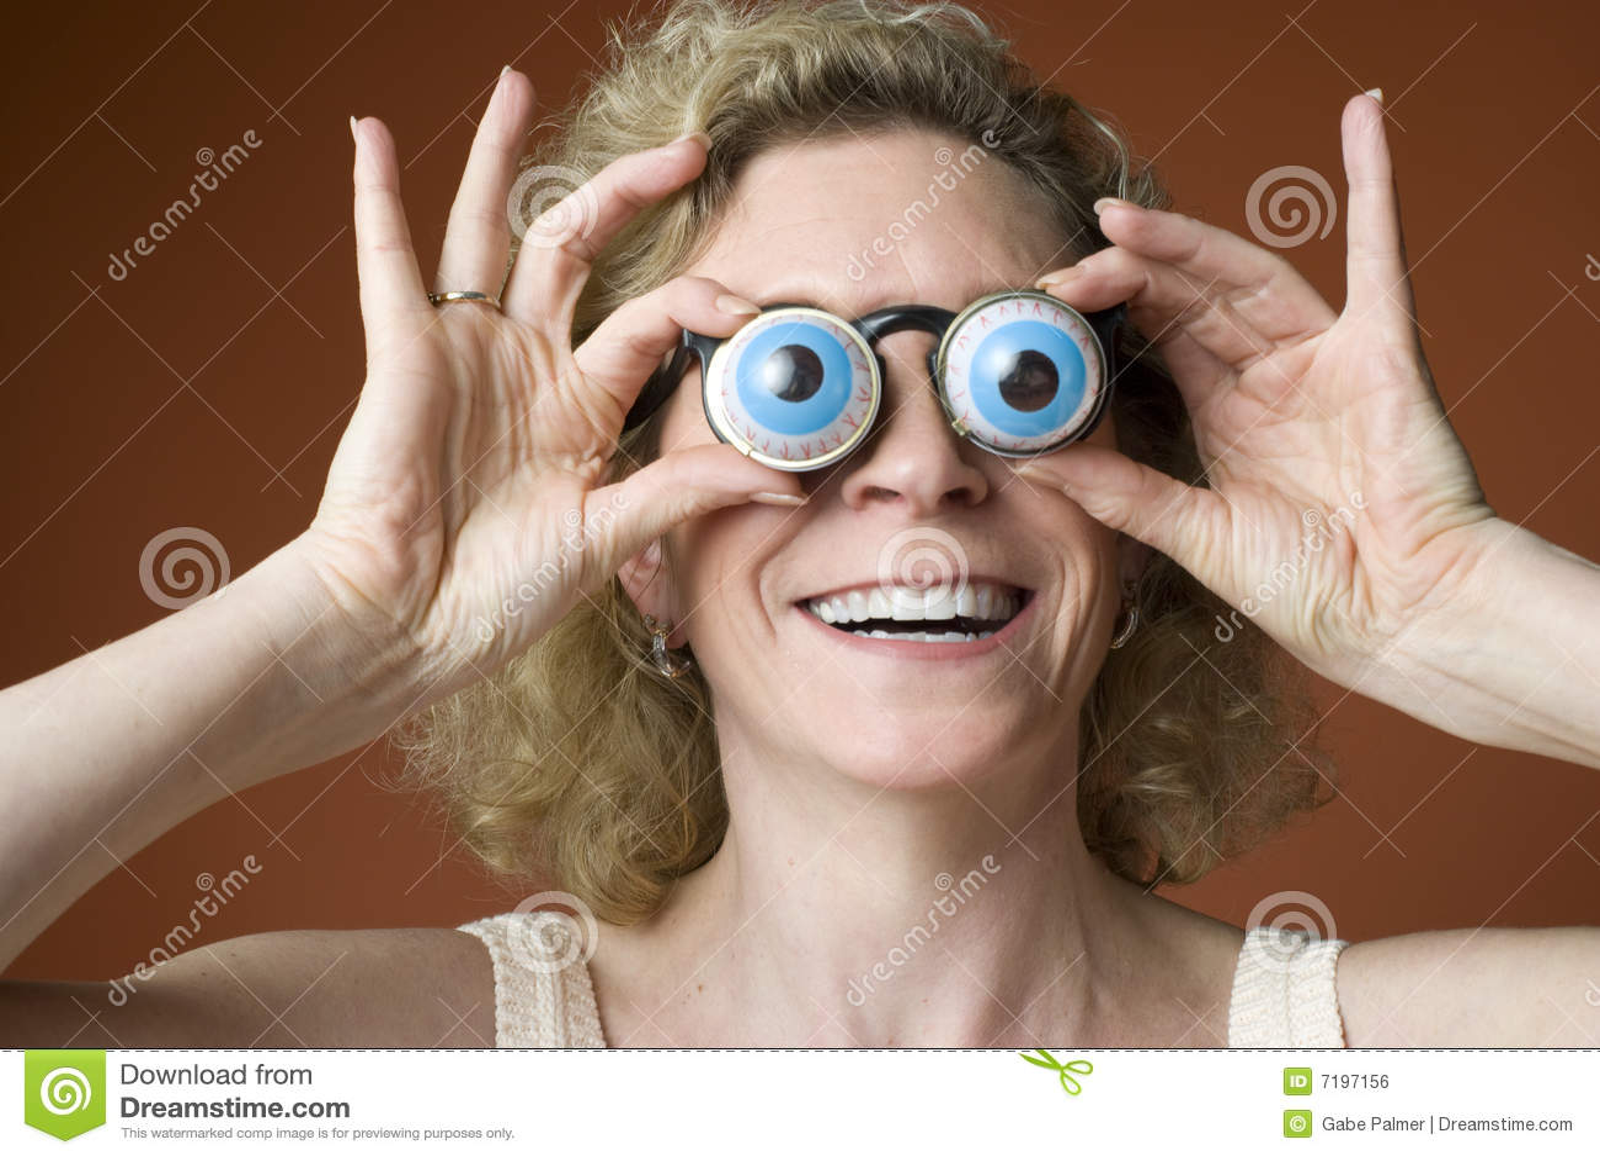 Woman Wearing Novelty Eyeglasses Stock Photo